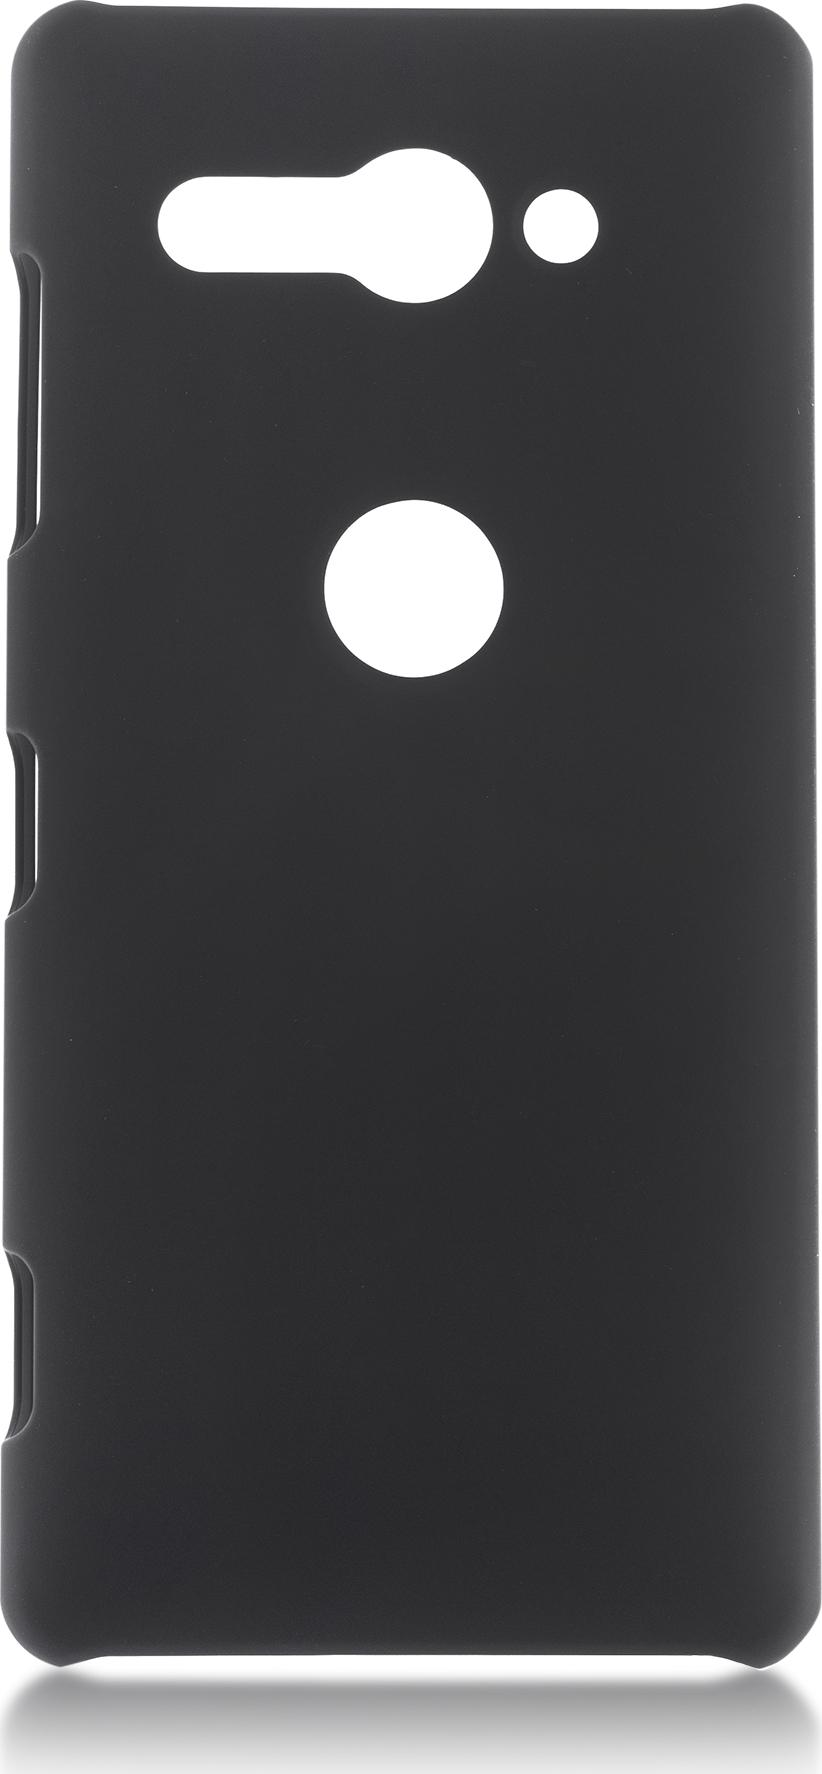 Чехол Brosco Soft-Touch для Sony Xperia XZ2 Compact, черный wierss розовый для sony xz2